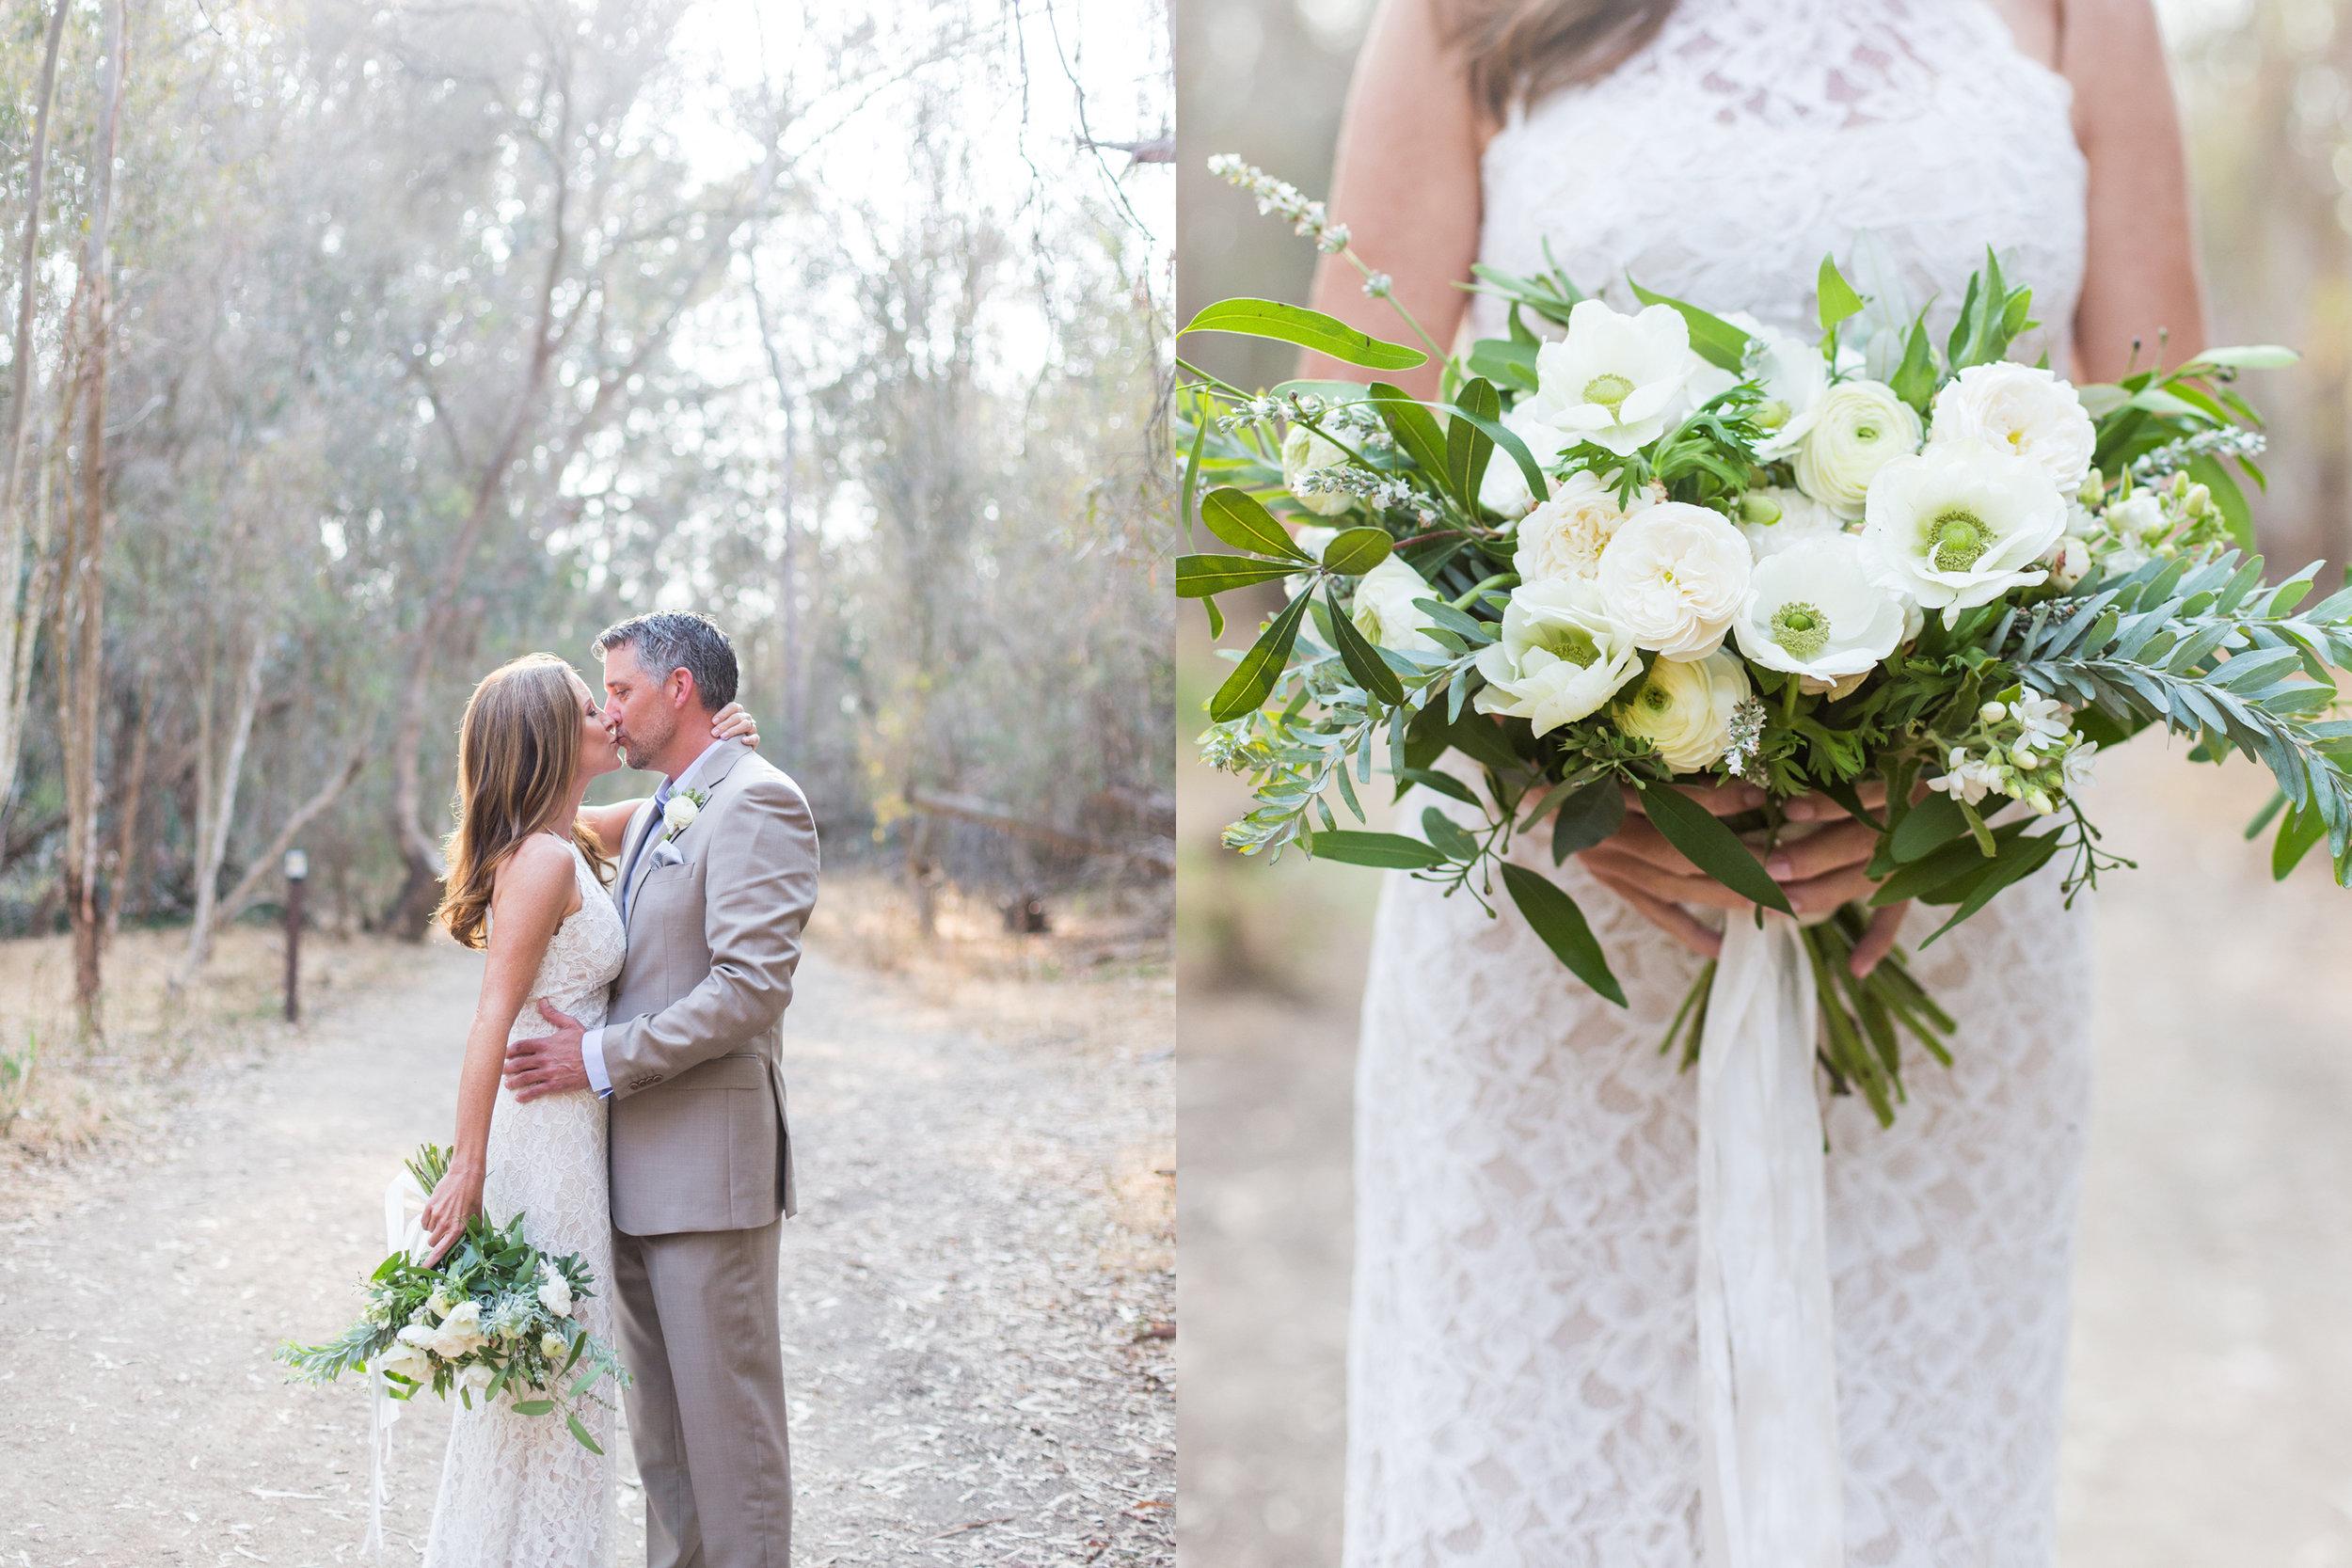 santa-barbara-elopement-elope-wedding-planner-coordinator-coordination-day-of-intimate-rustic-ellwood-bluffs-forest-beach-ocean-view-green-white-event (2).jpg